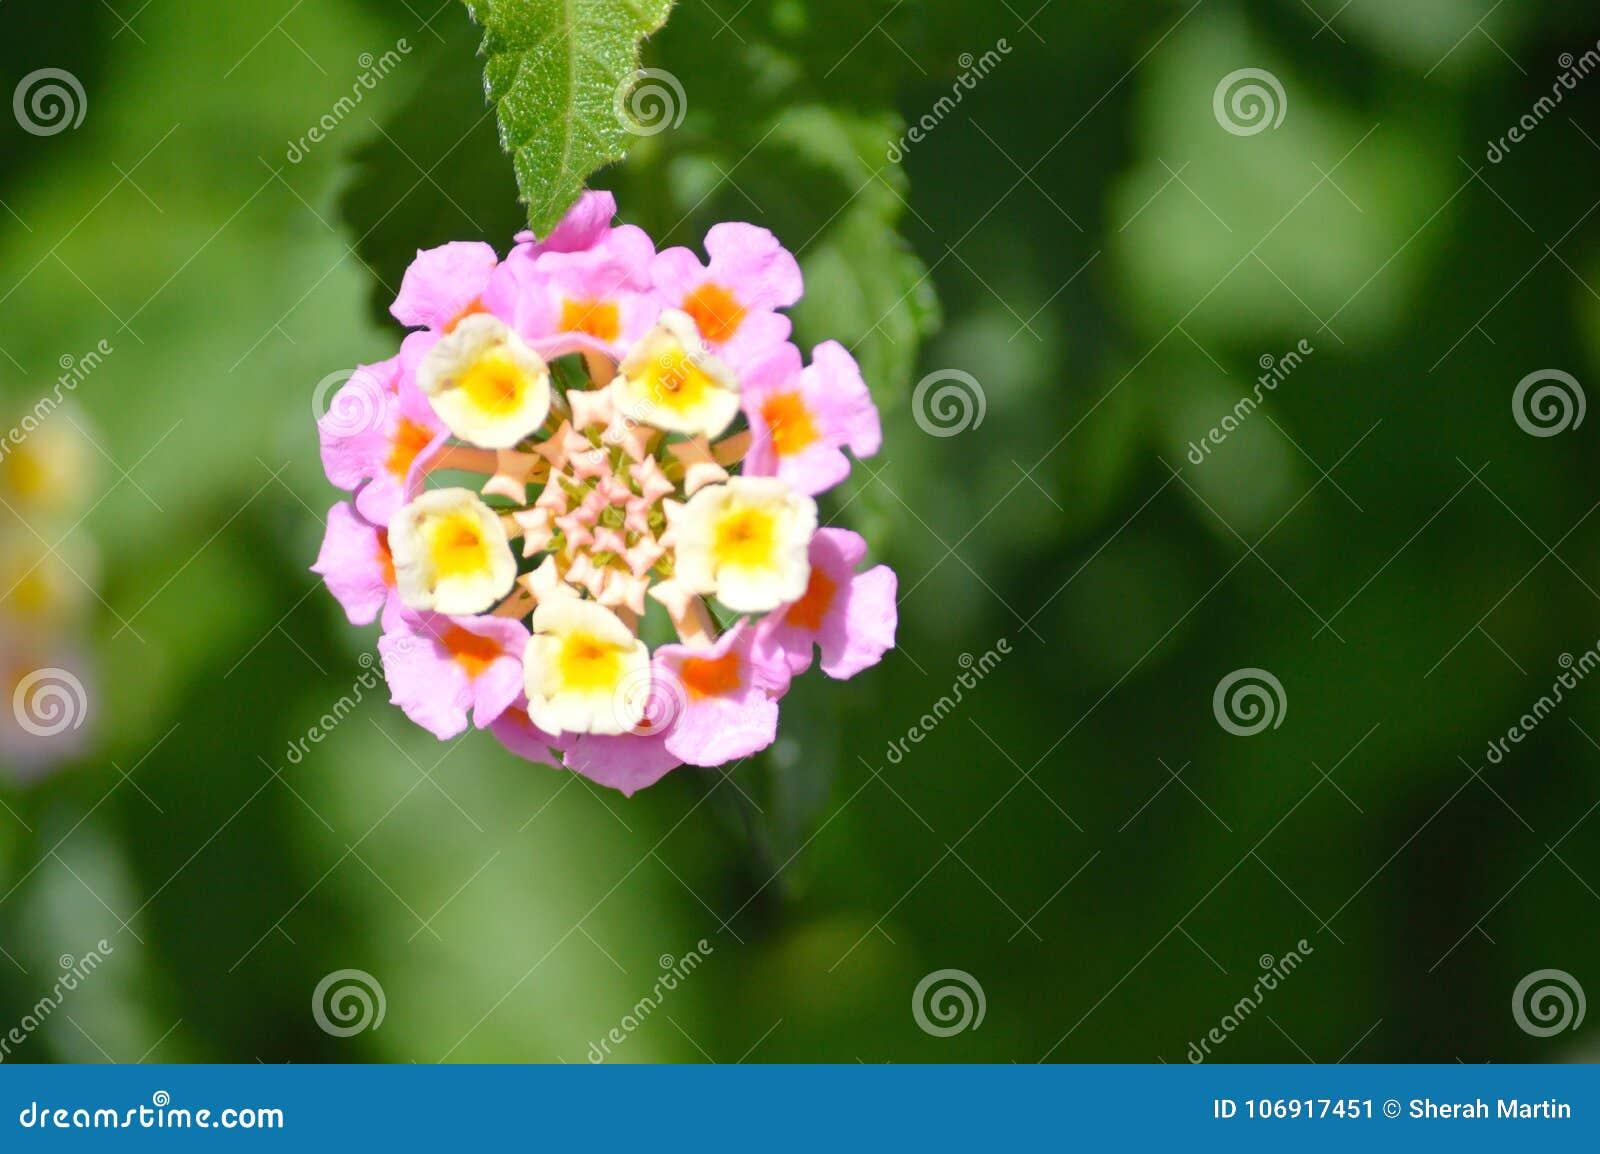 Lantana Pink And Yellow Stock Image Image Of Perennial 106917451